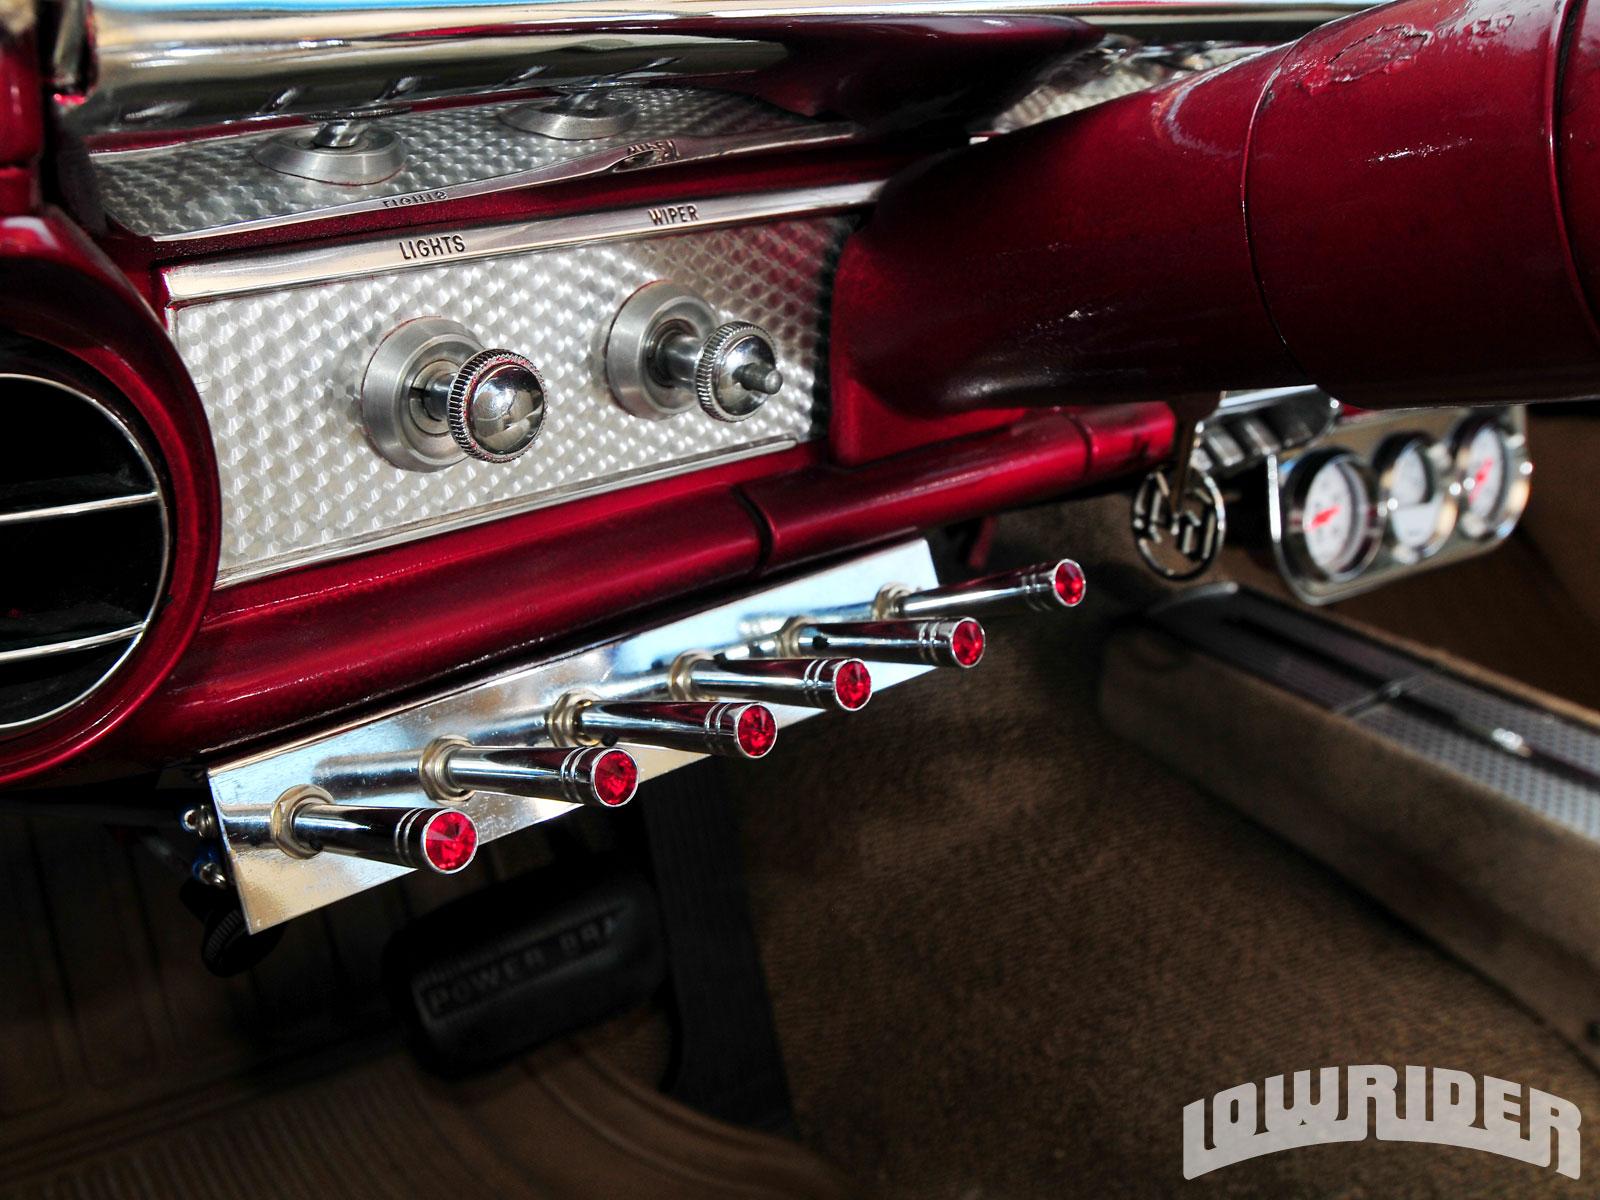 1964 Chevrolet Impala SS - Lowrider Magazine